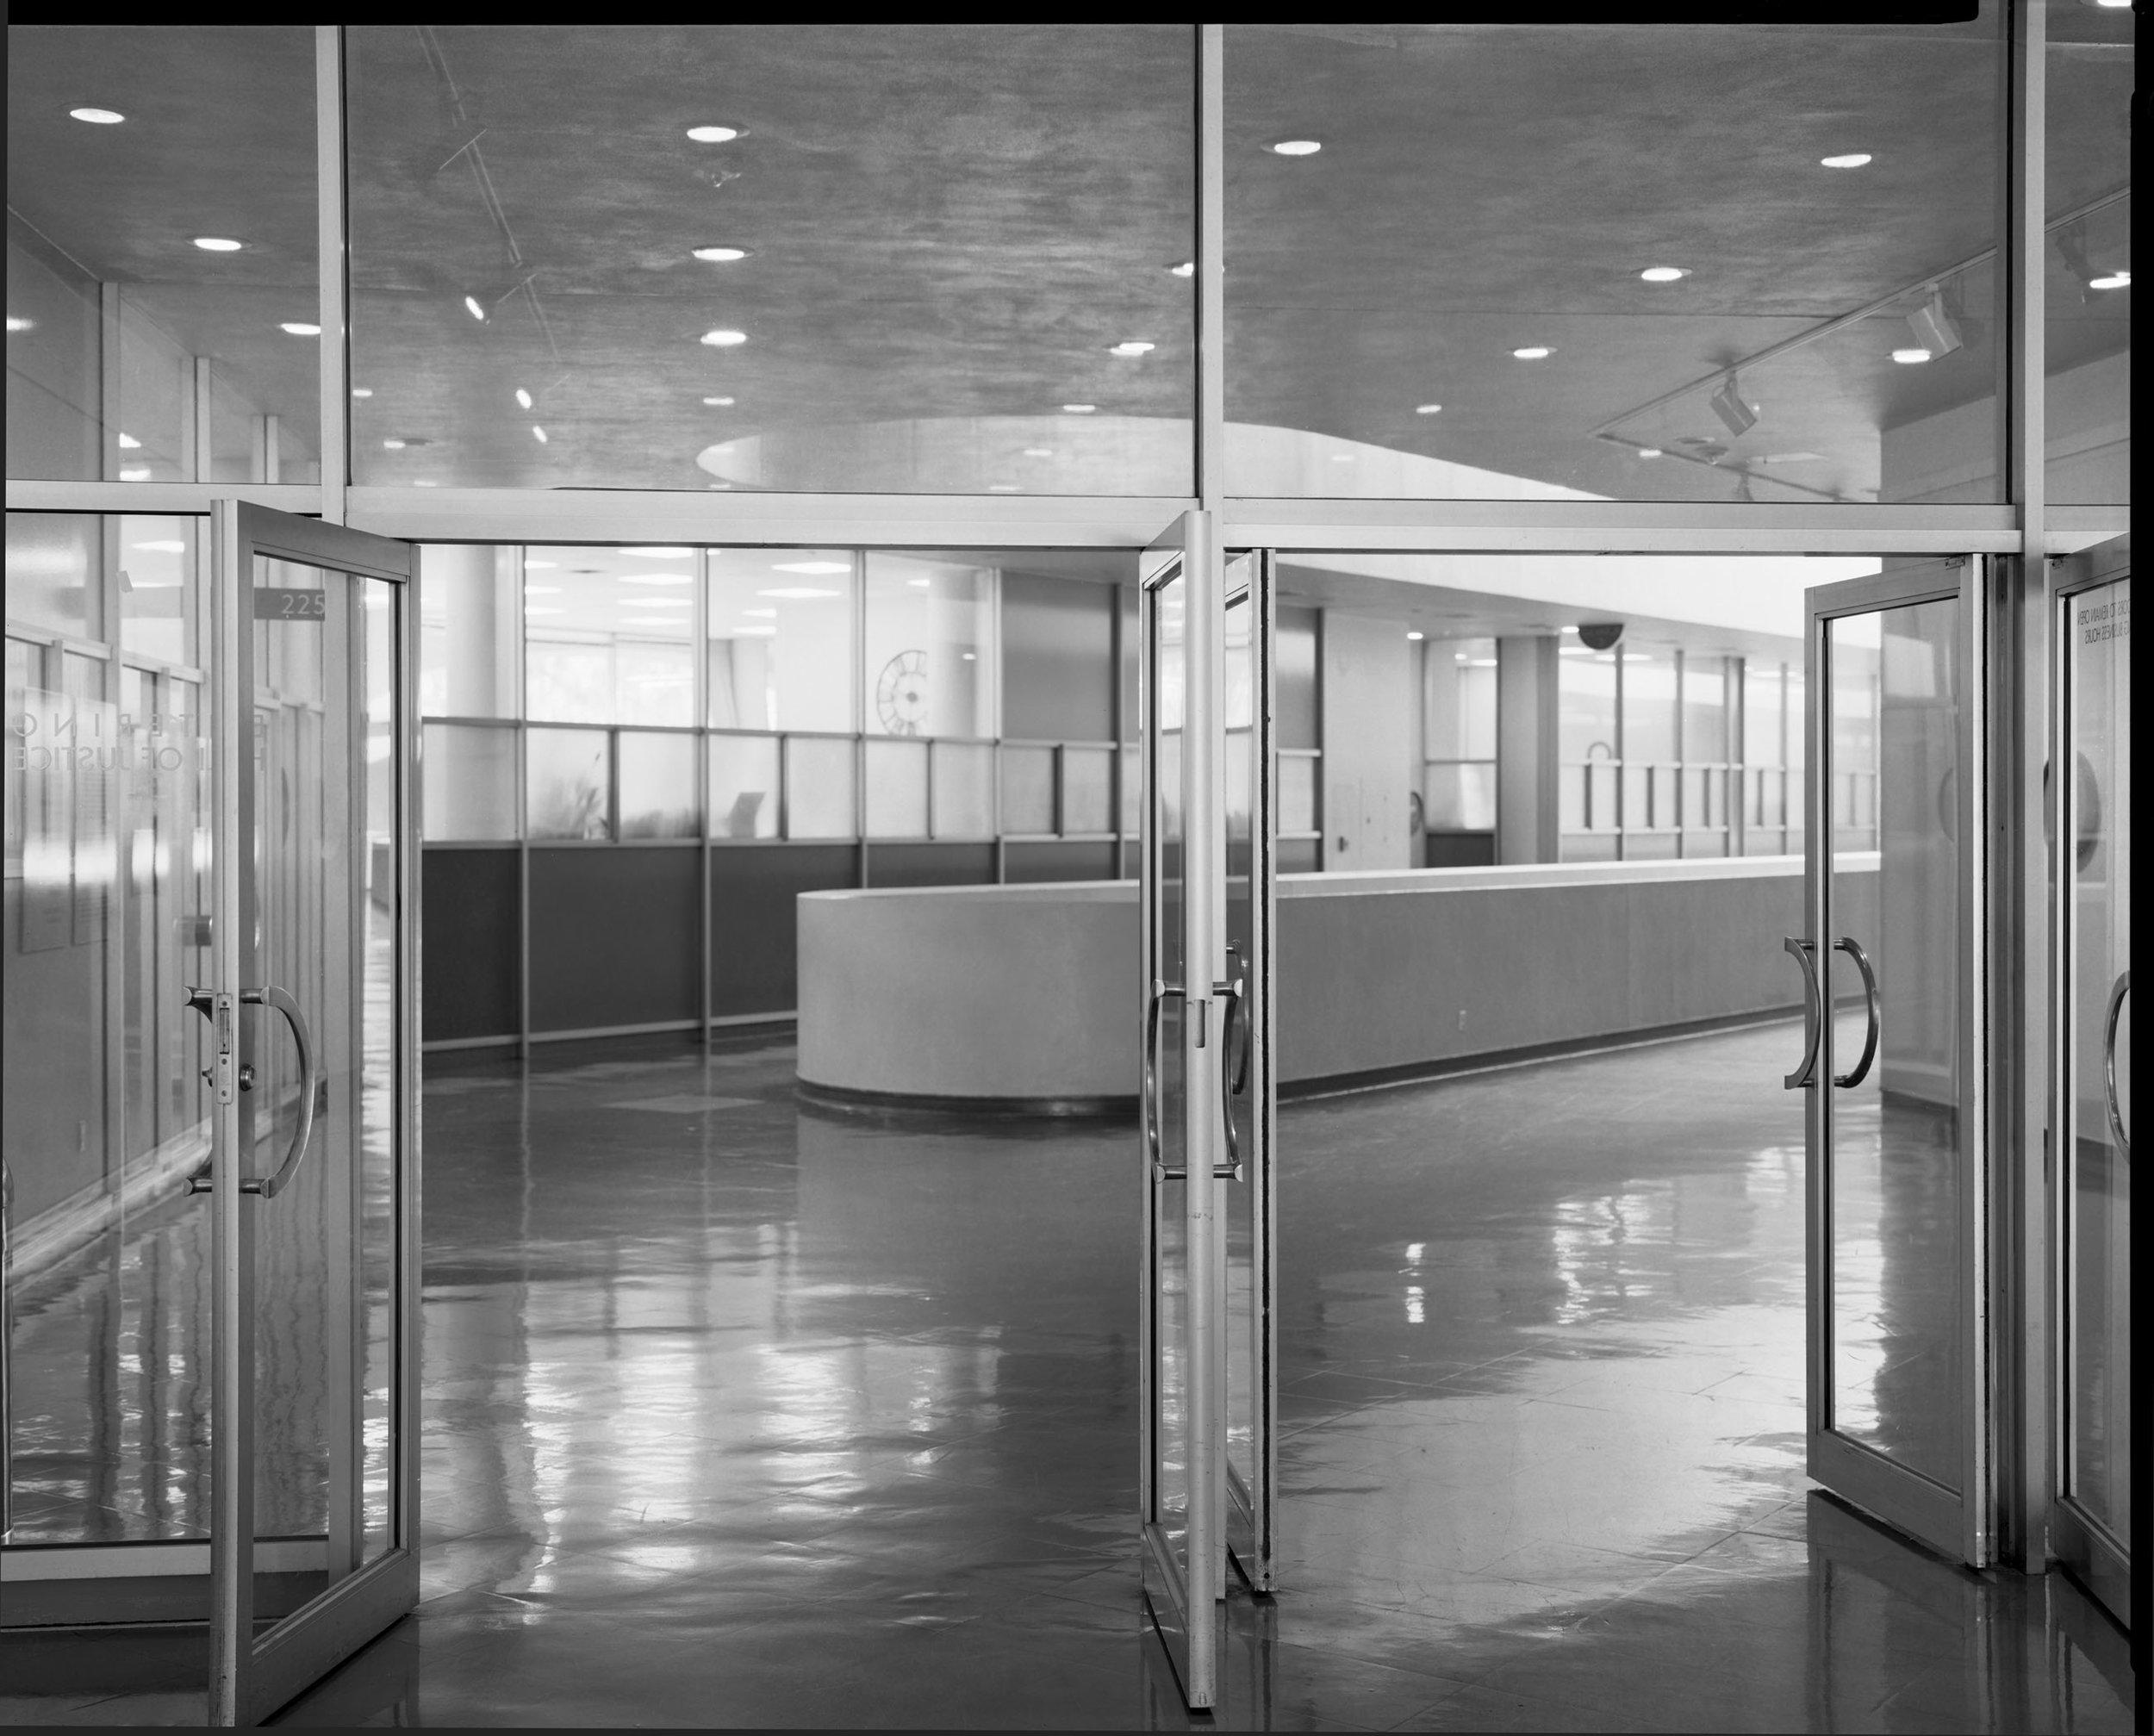 Marin Civic Center 007 sm.jpg